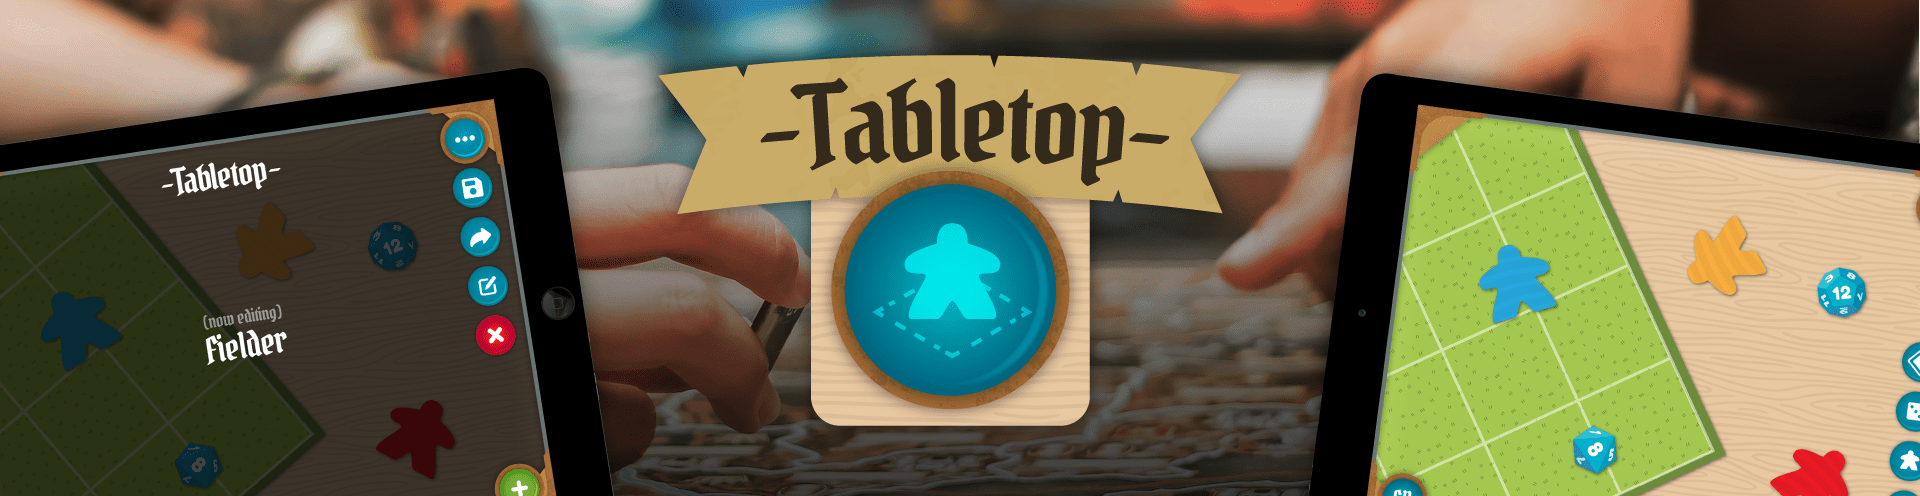 Tabletop User Interface Header